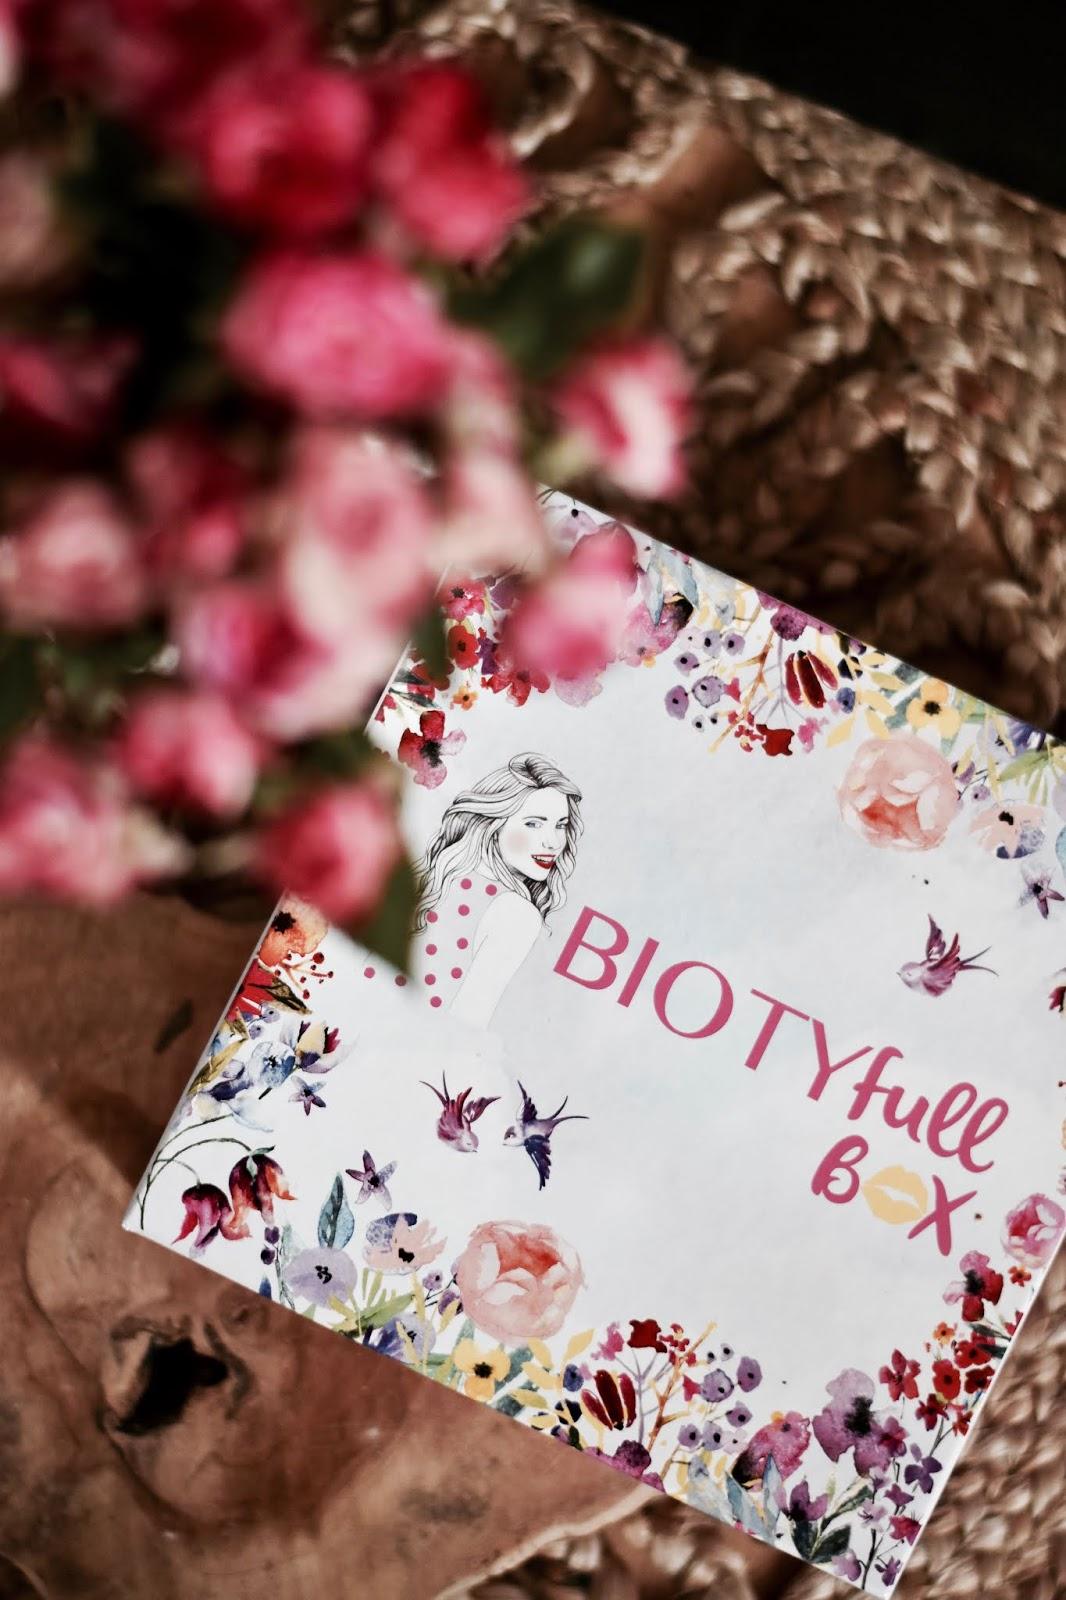 biotyfull box : avis 2019